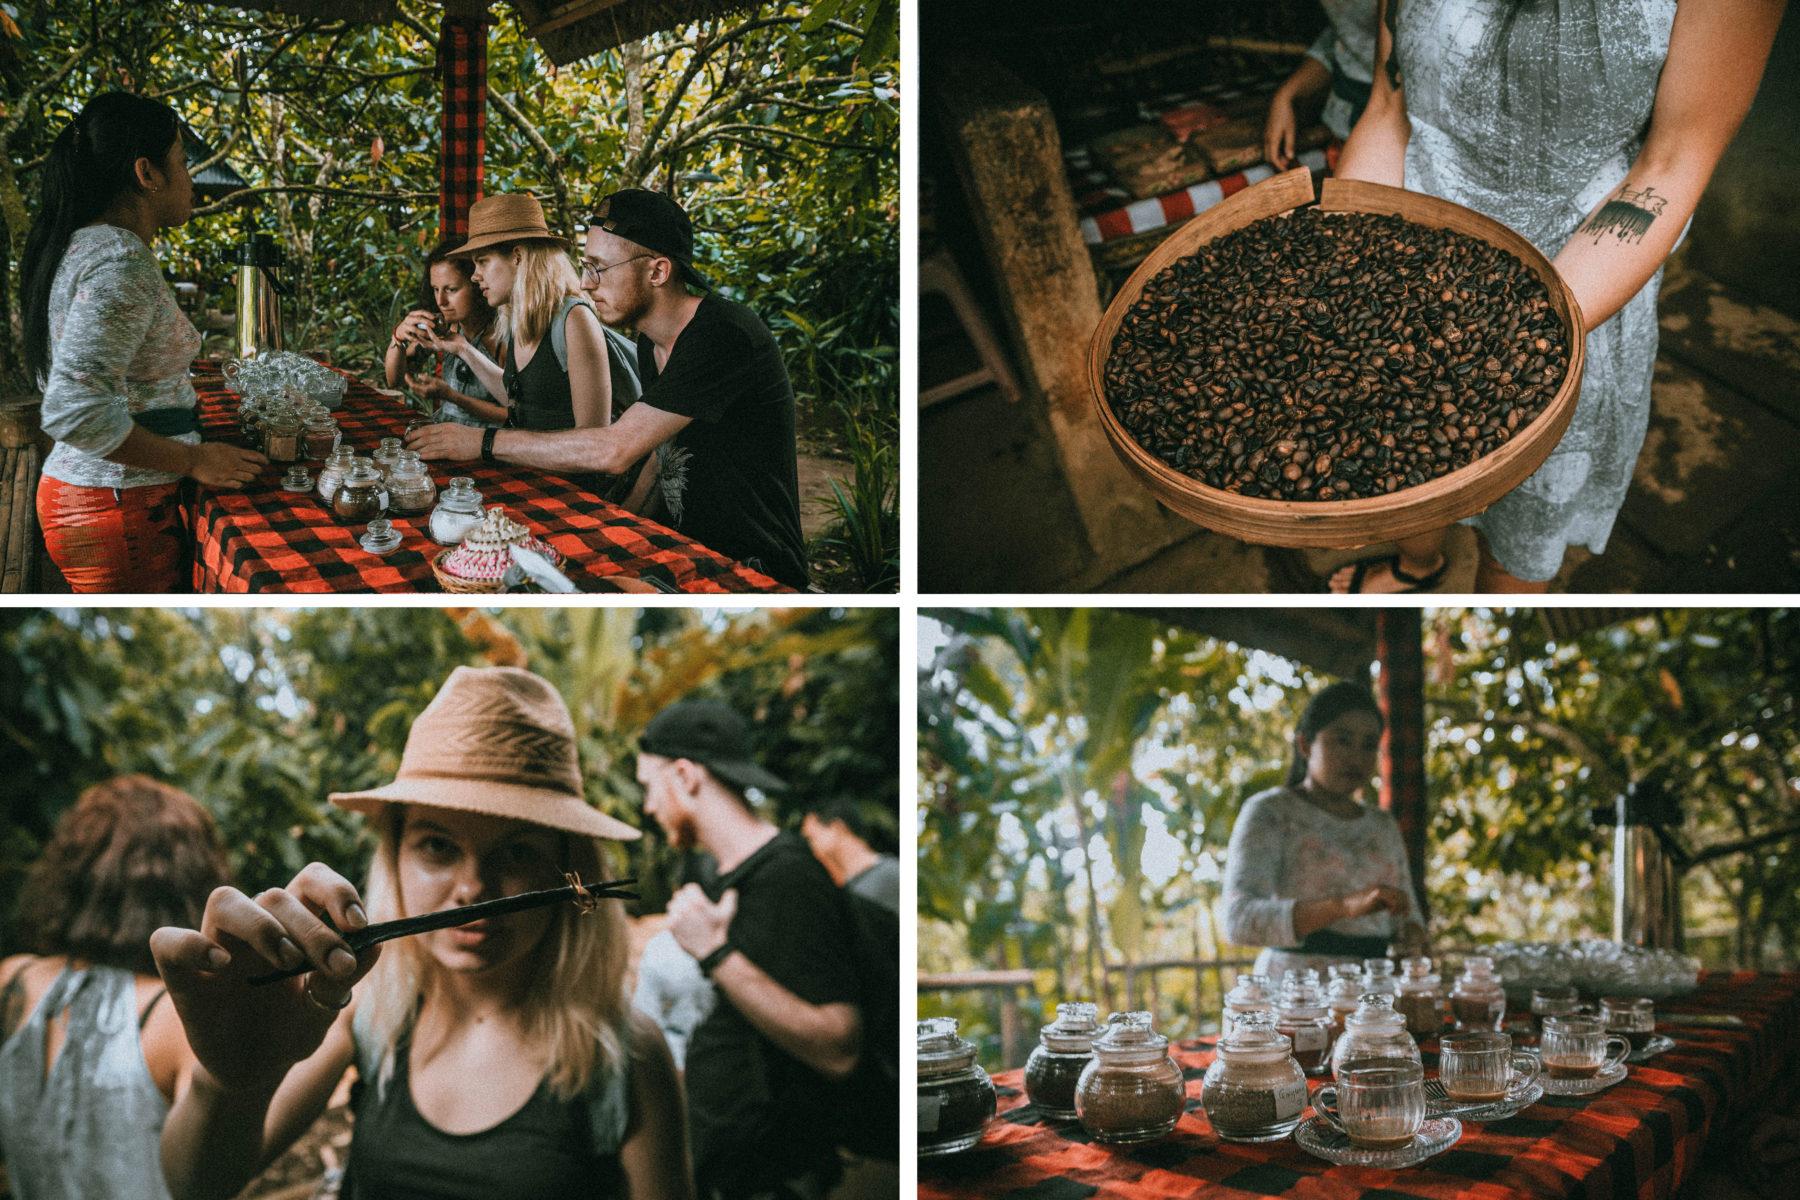 bali indonesia luwak coffee tasting authentic experience